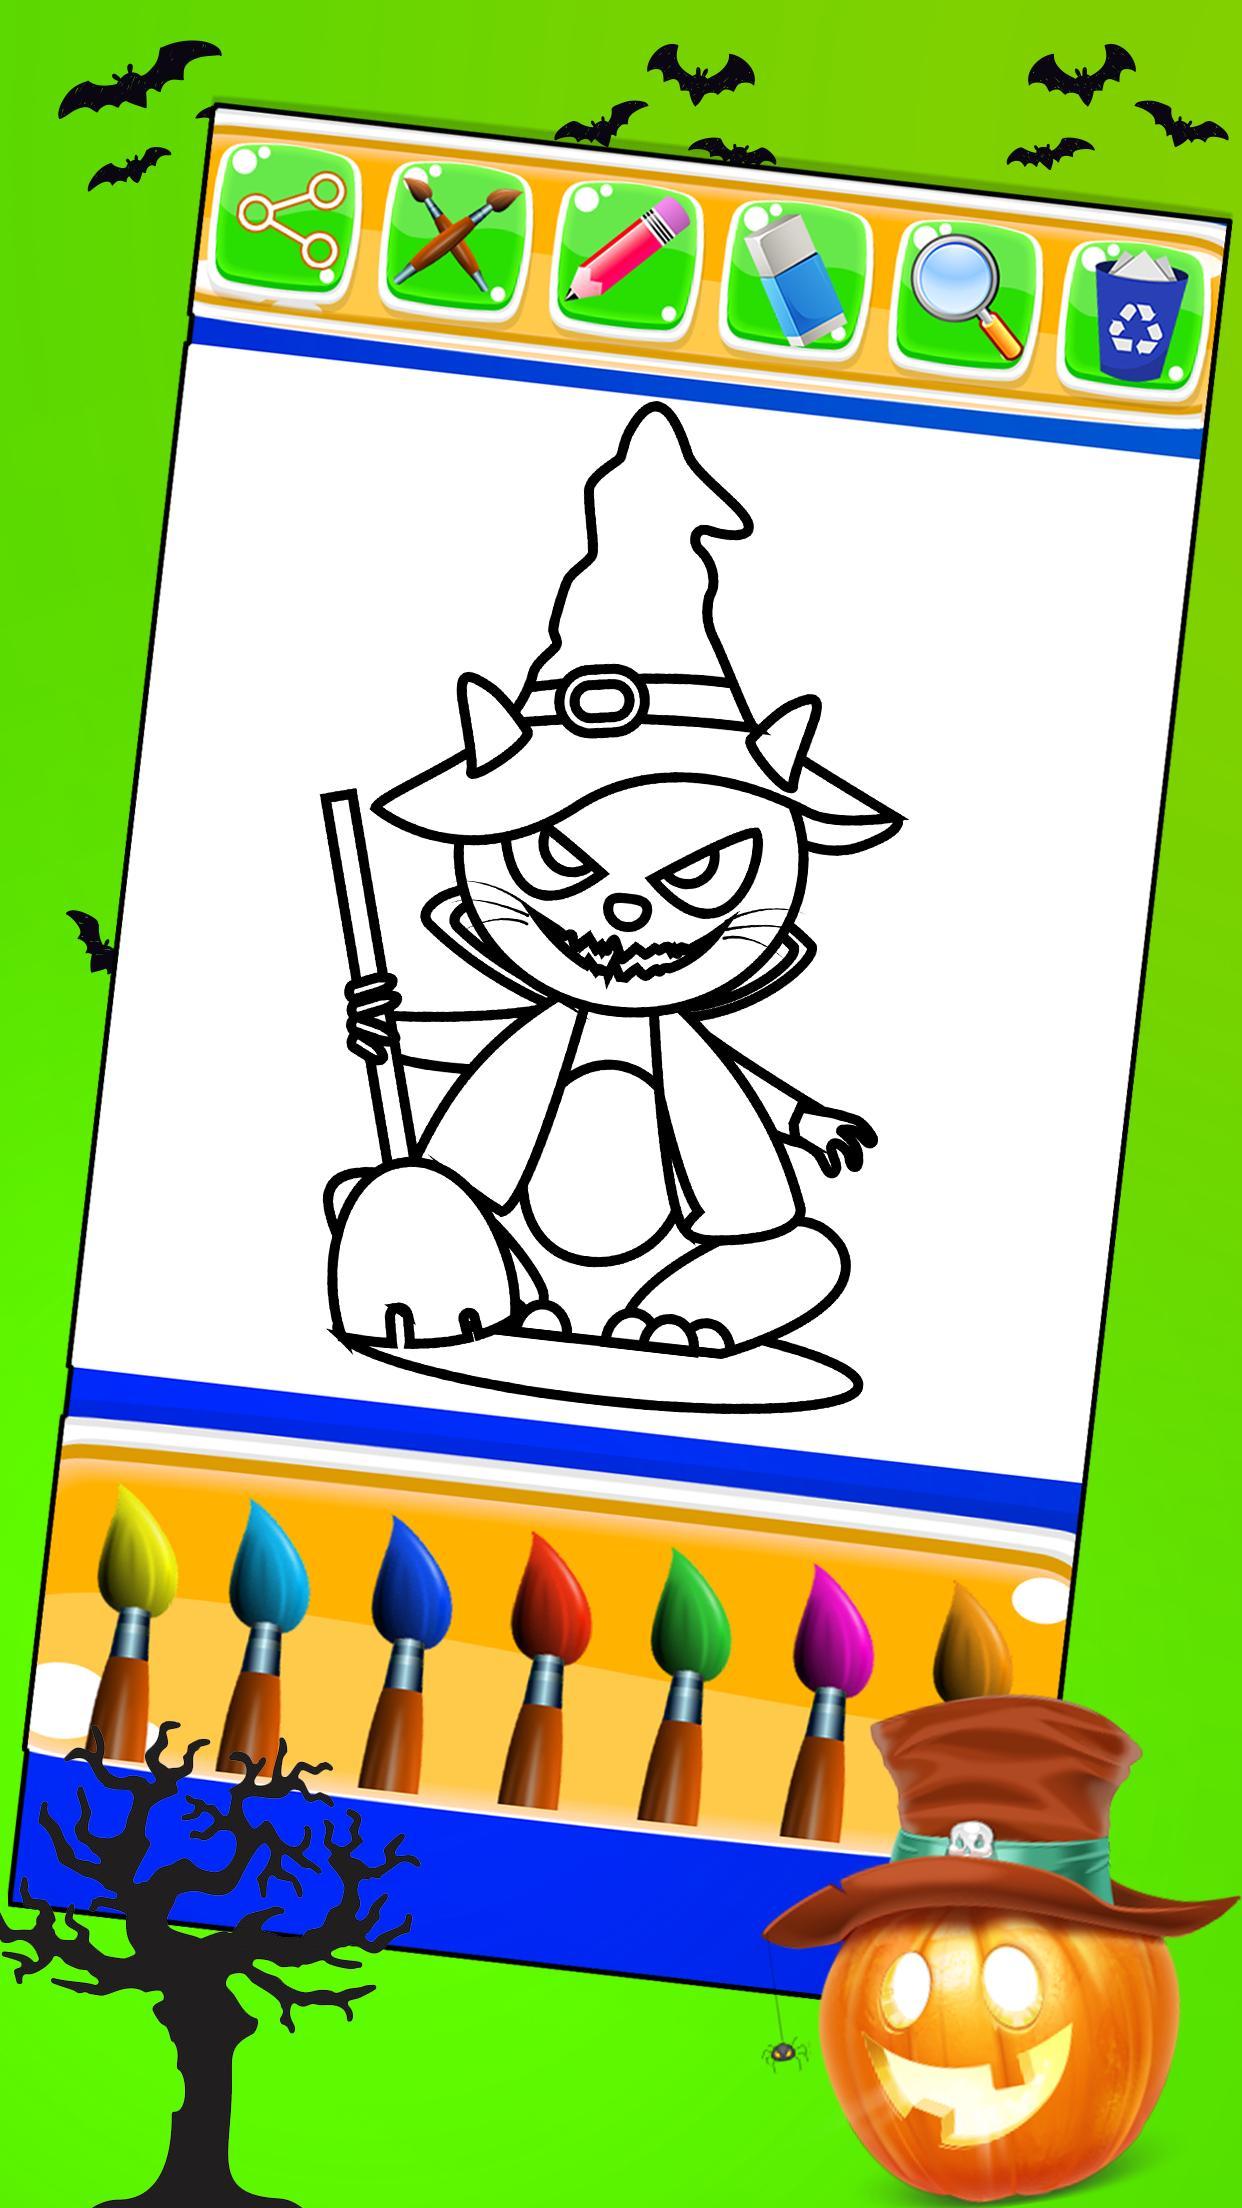 Halloween Coloring Book Pages Kids Coloring Game для андроид